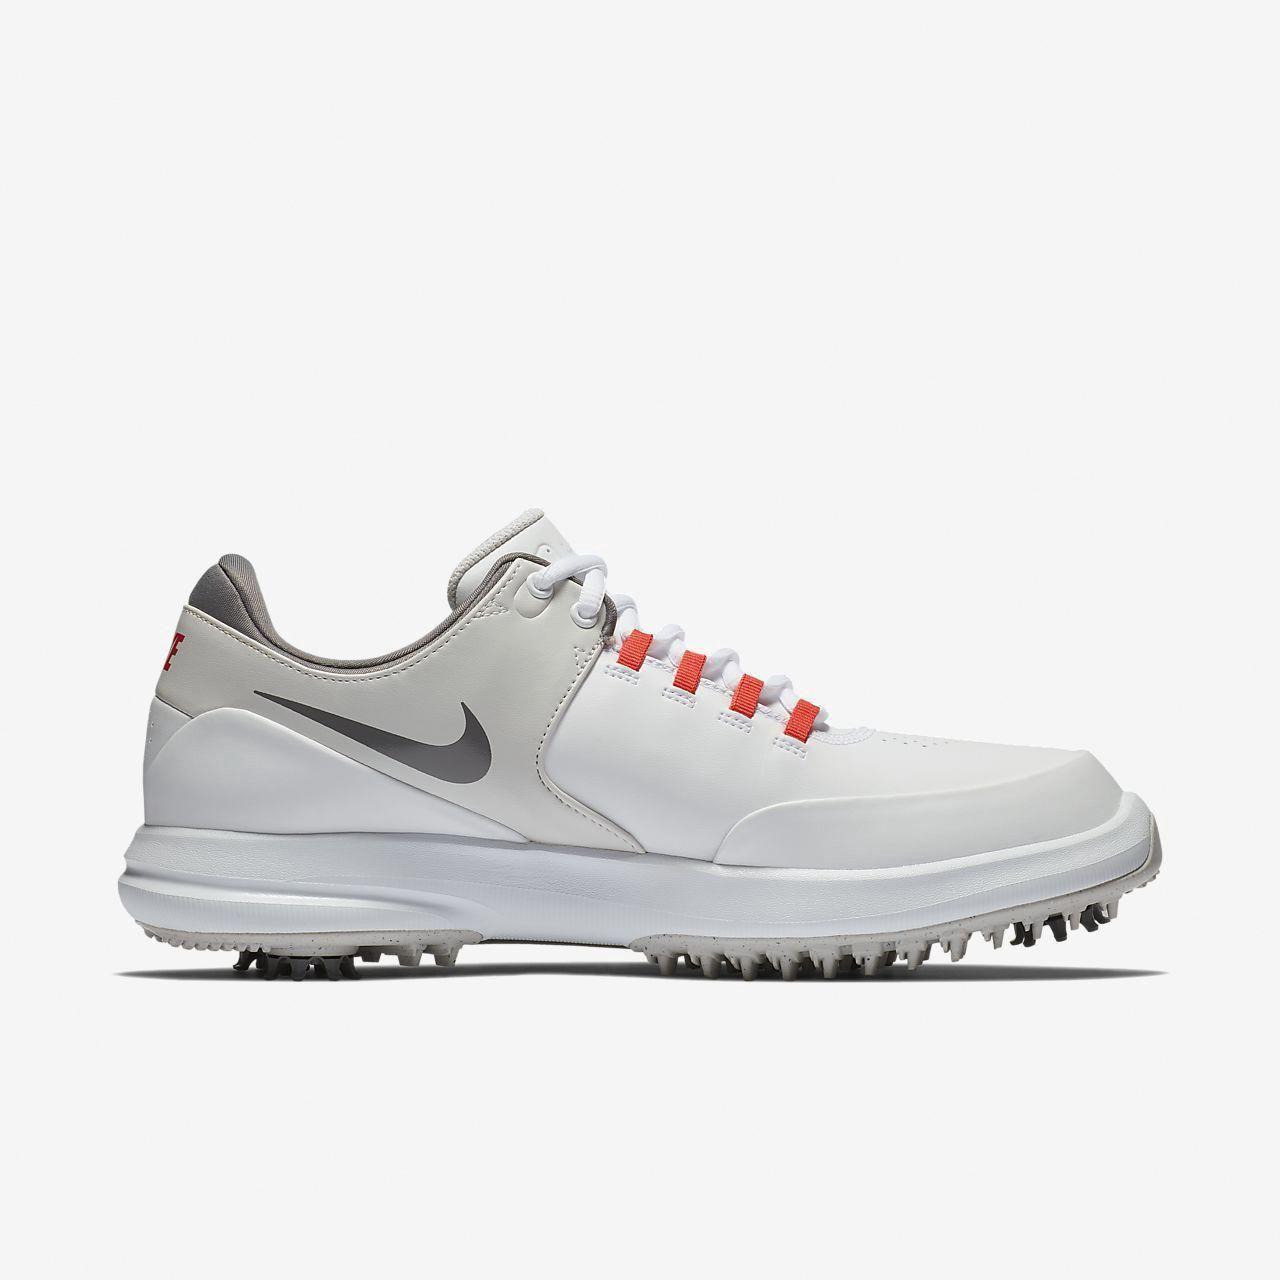 Nike Air Zoom Accurate Men's Golf Shoe 11.5